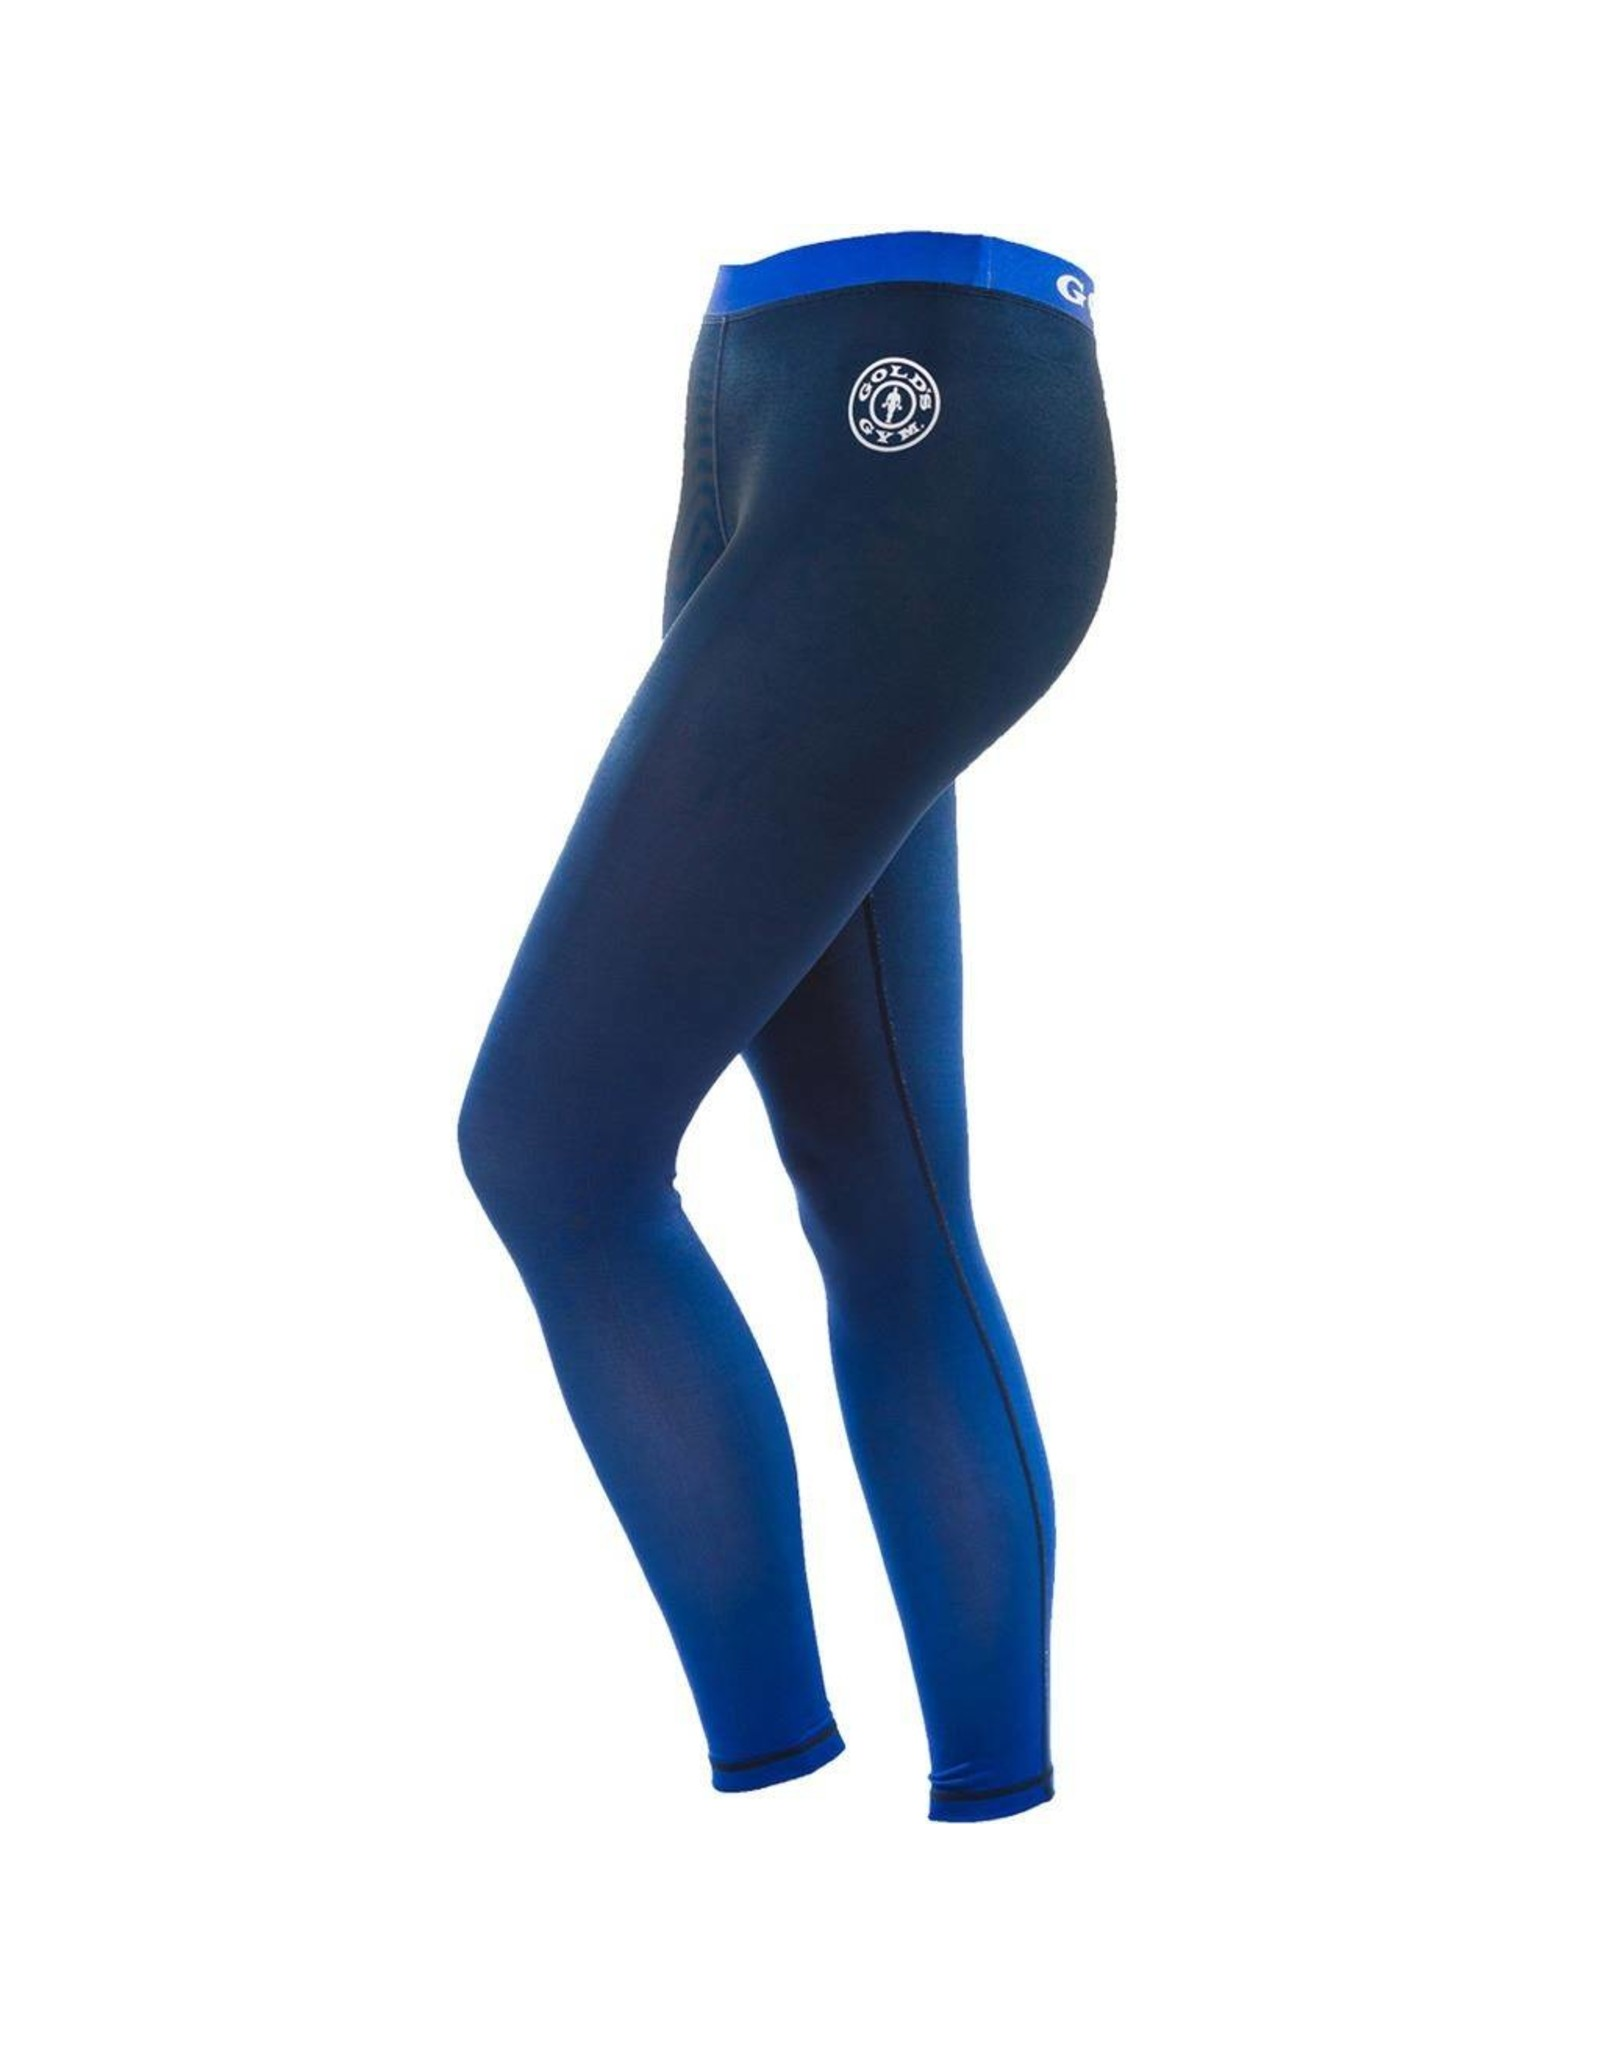 Gold's Gym Ladies Gradient Sublimated Gym Leggings - Blue